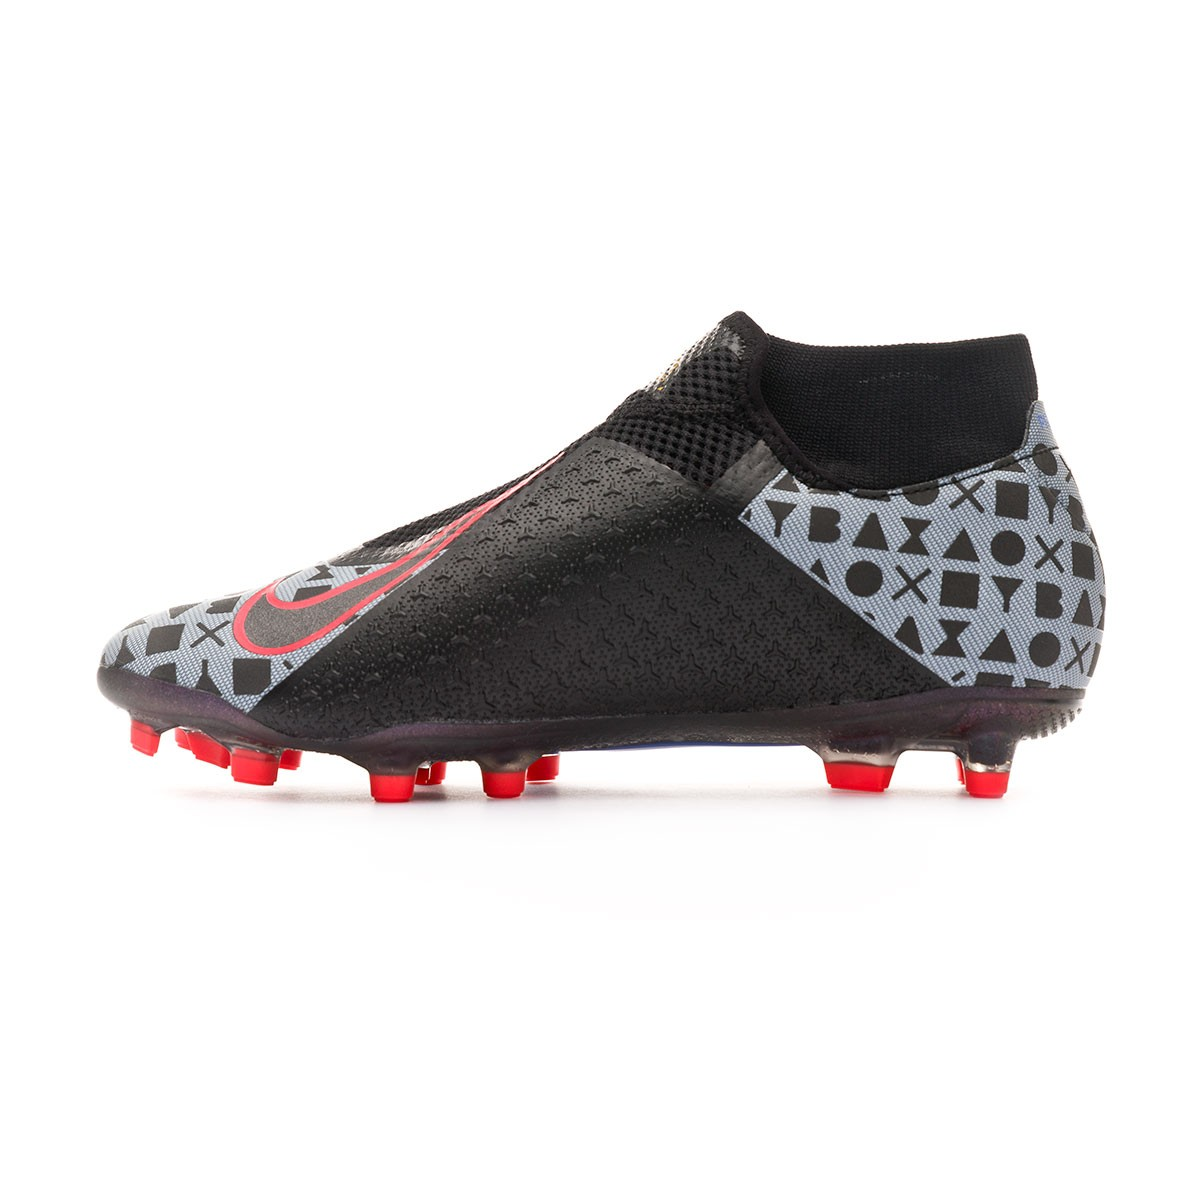 b106c58e4d6 Football Boots Nike Phantom Vision Academy DF MG EA Sports  White-Black-Bright crimon-Royal pulse - Tienda de fútbol Fútbol Emotion